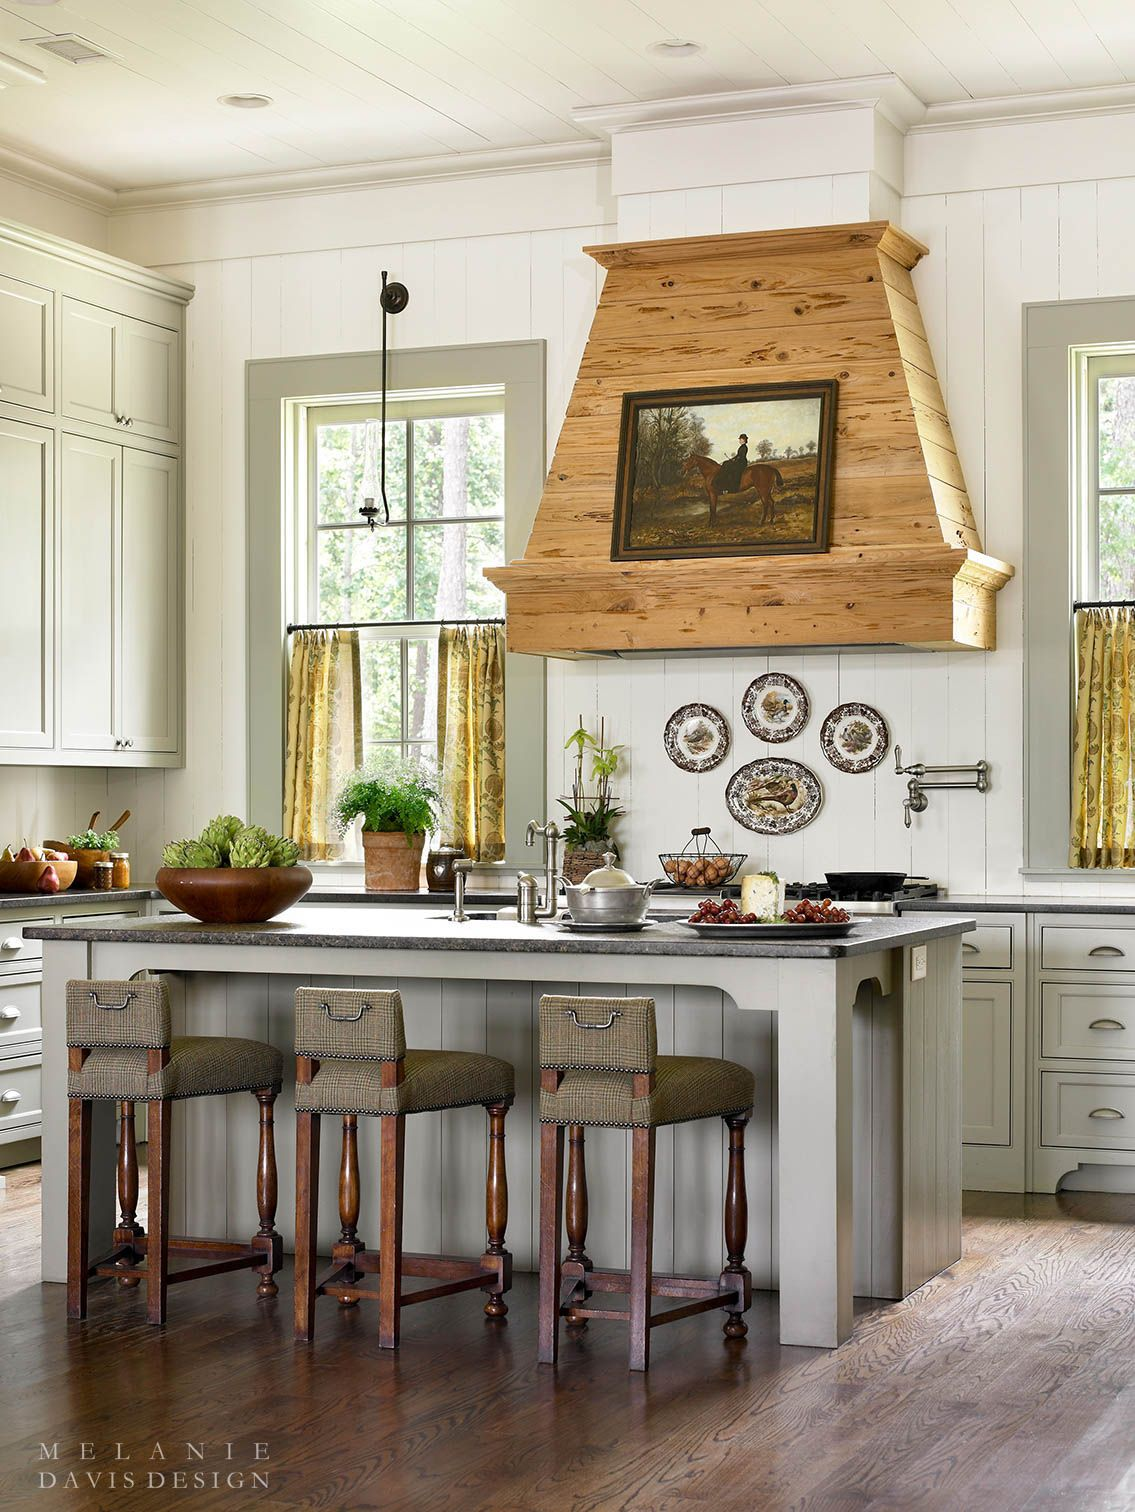 Melaniedavisdesign Melaniedavis Melaniedavisbracey Ejfollowill Kitchen Bathideas 268 Jpg Country Kitchen